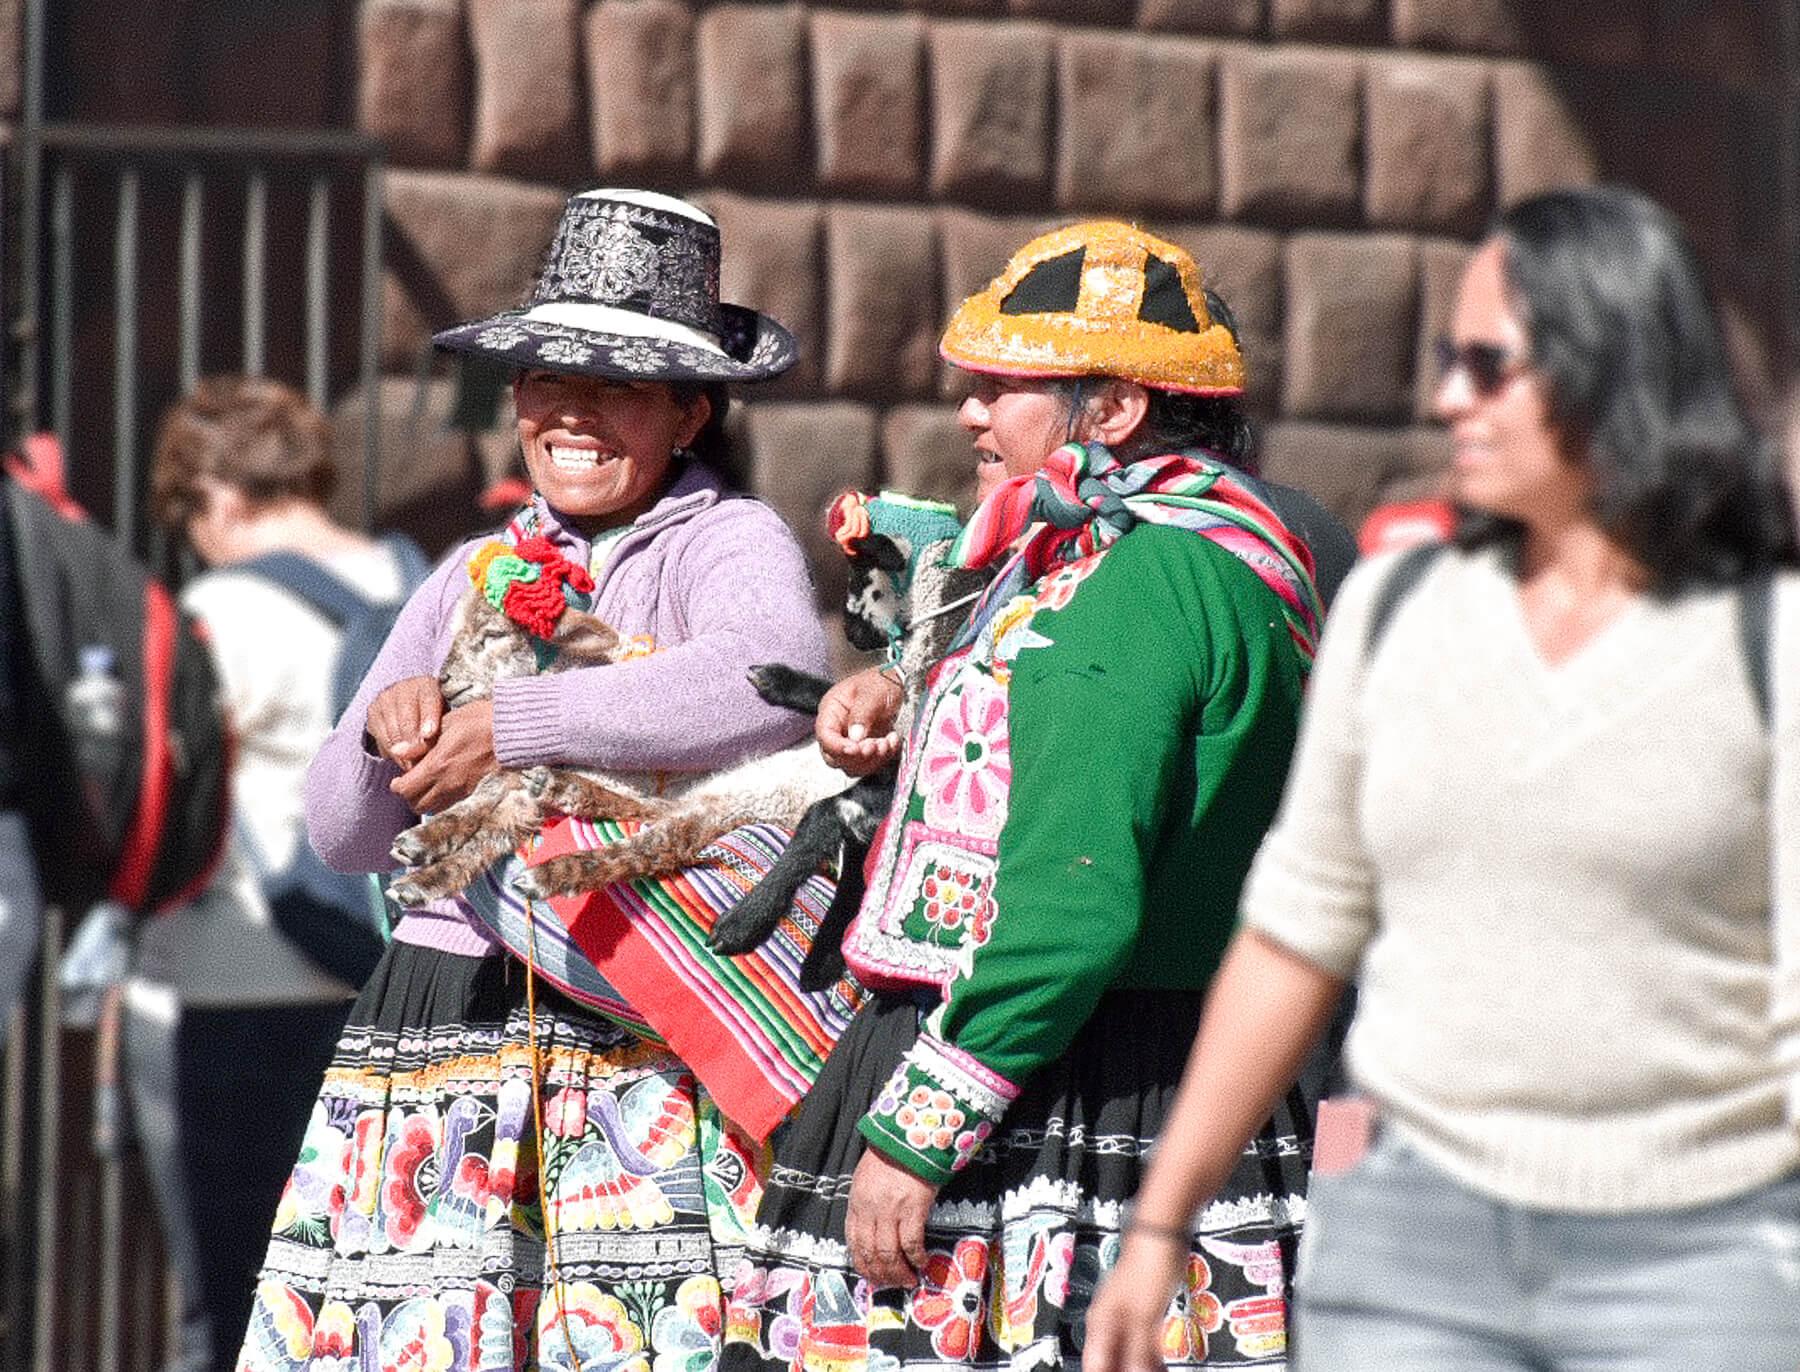 2 smiling Peruvian ladies chatting and holding baby llamas